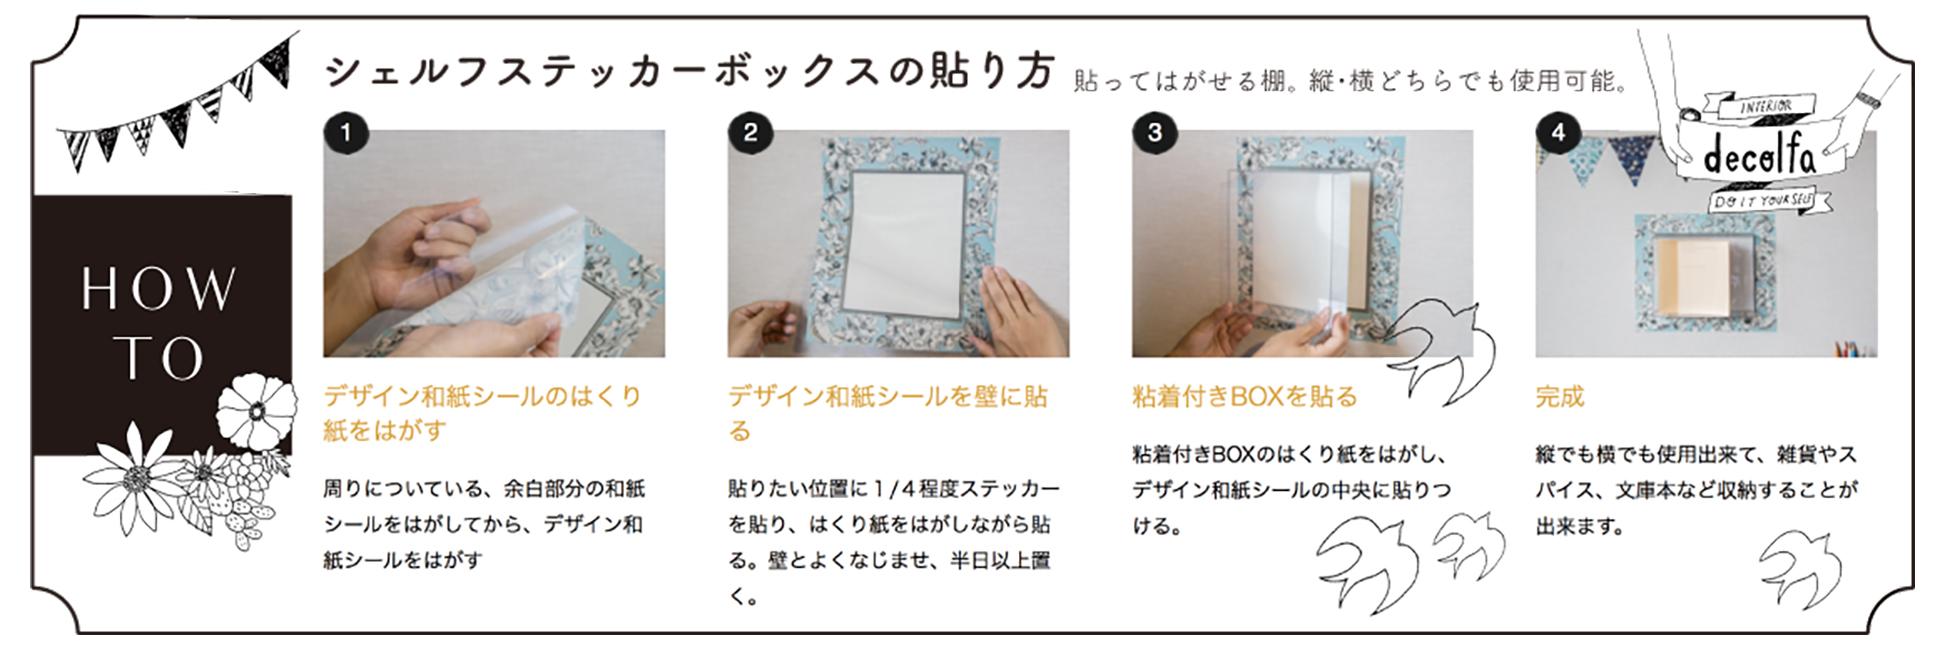 【SALE】decolfa スペシャルセット -Antique style